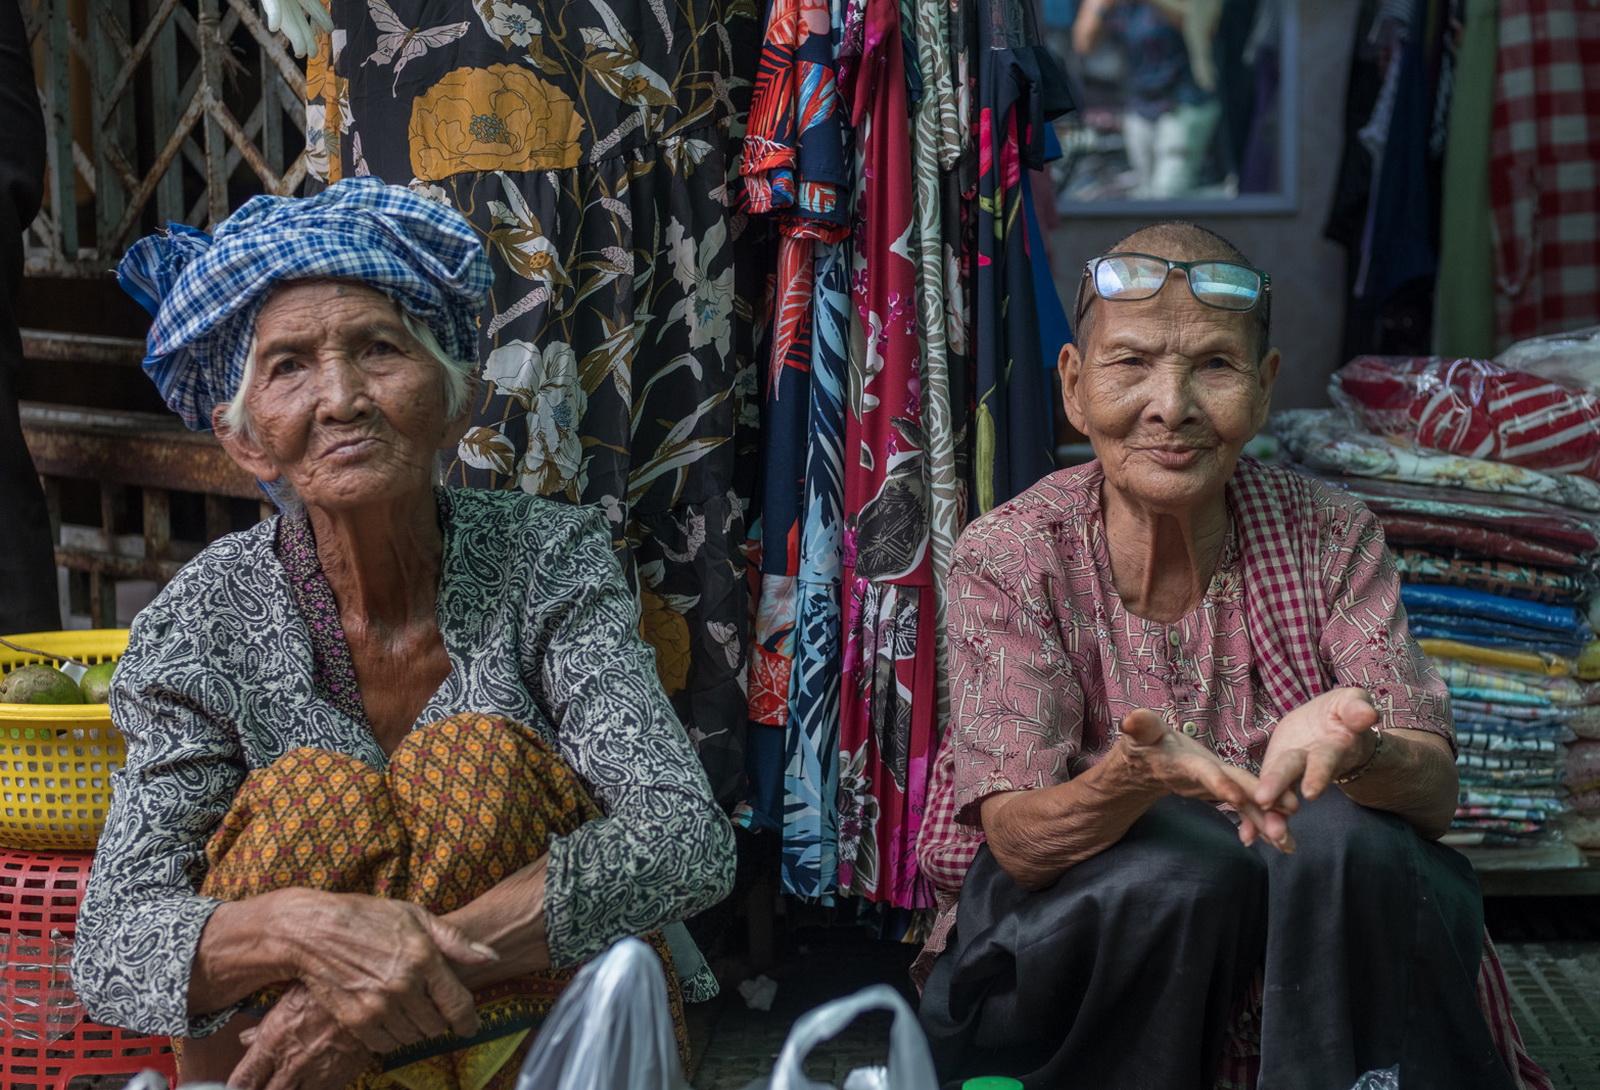 Cambodia Street Photography. Elderly market vendors by Jeff Perigois